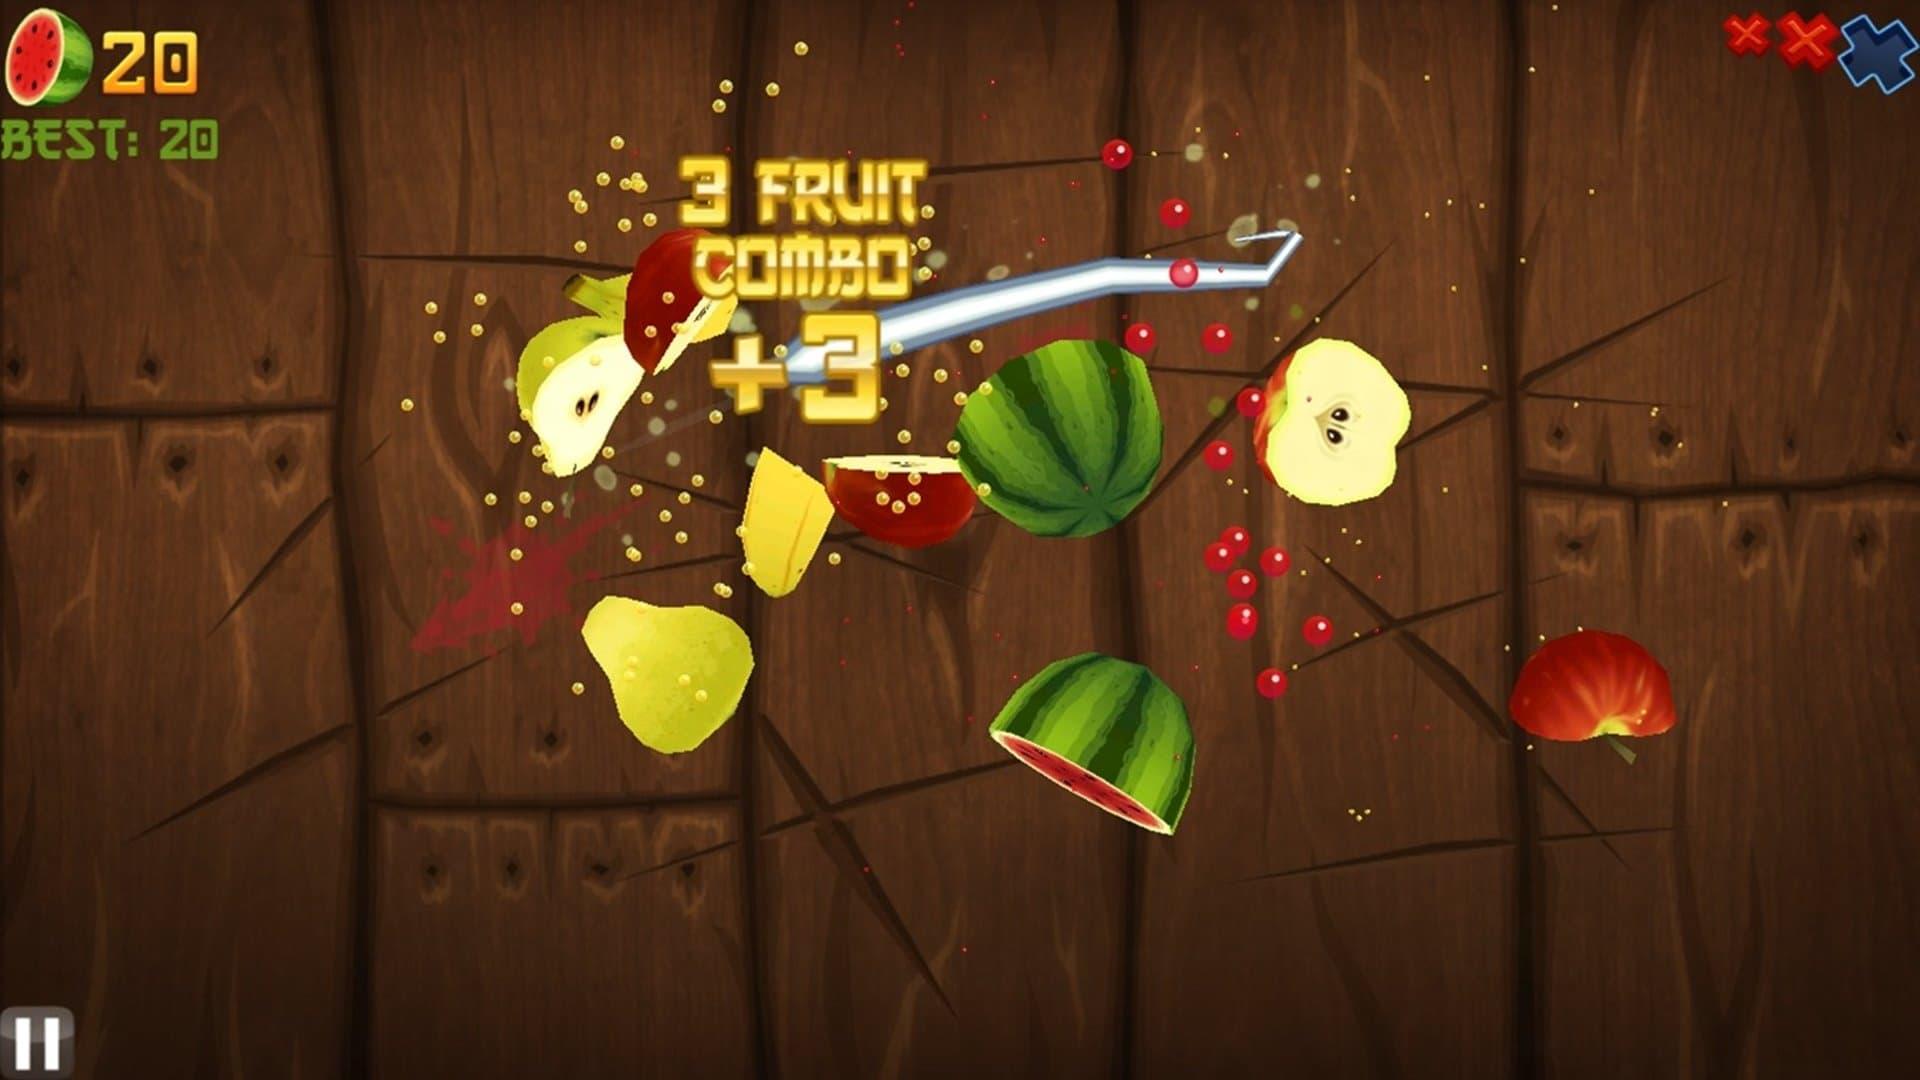 Fruit Ninja (2010)